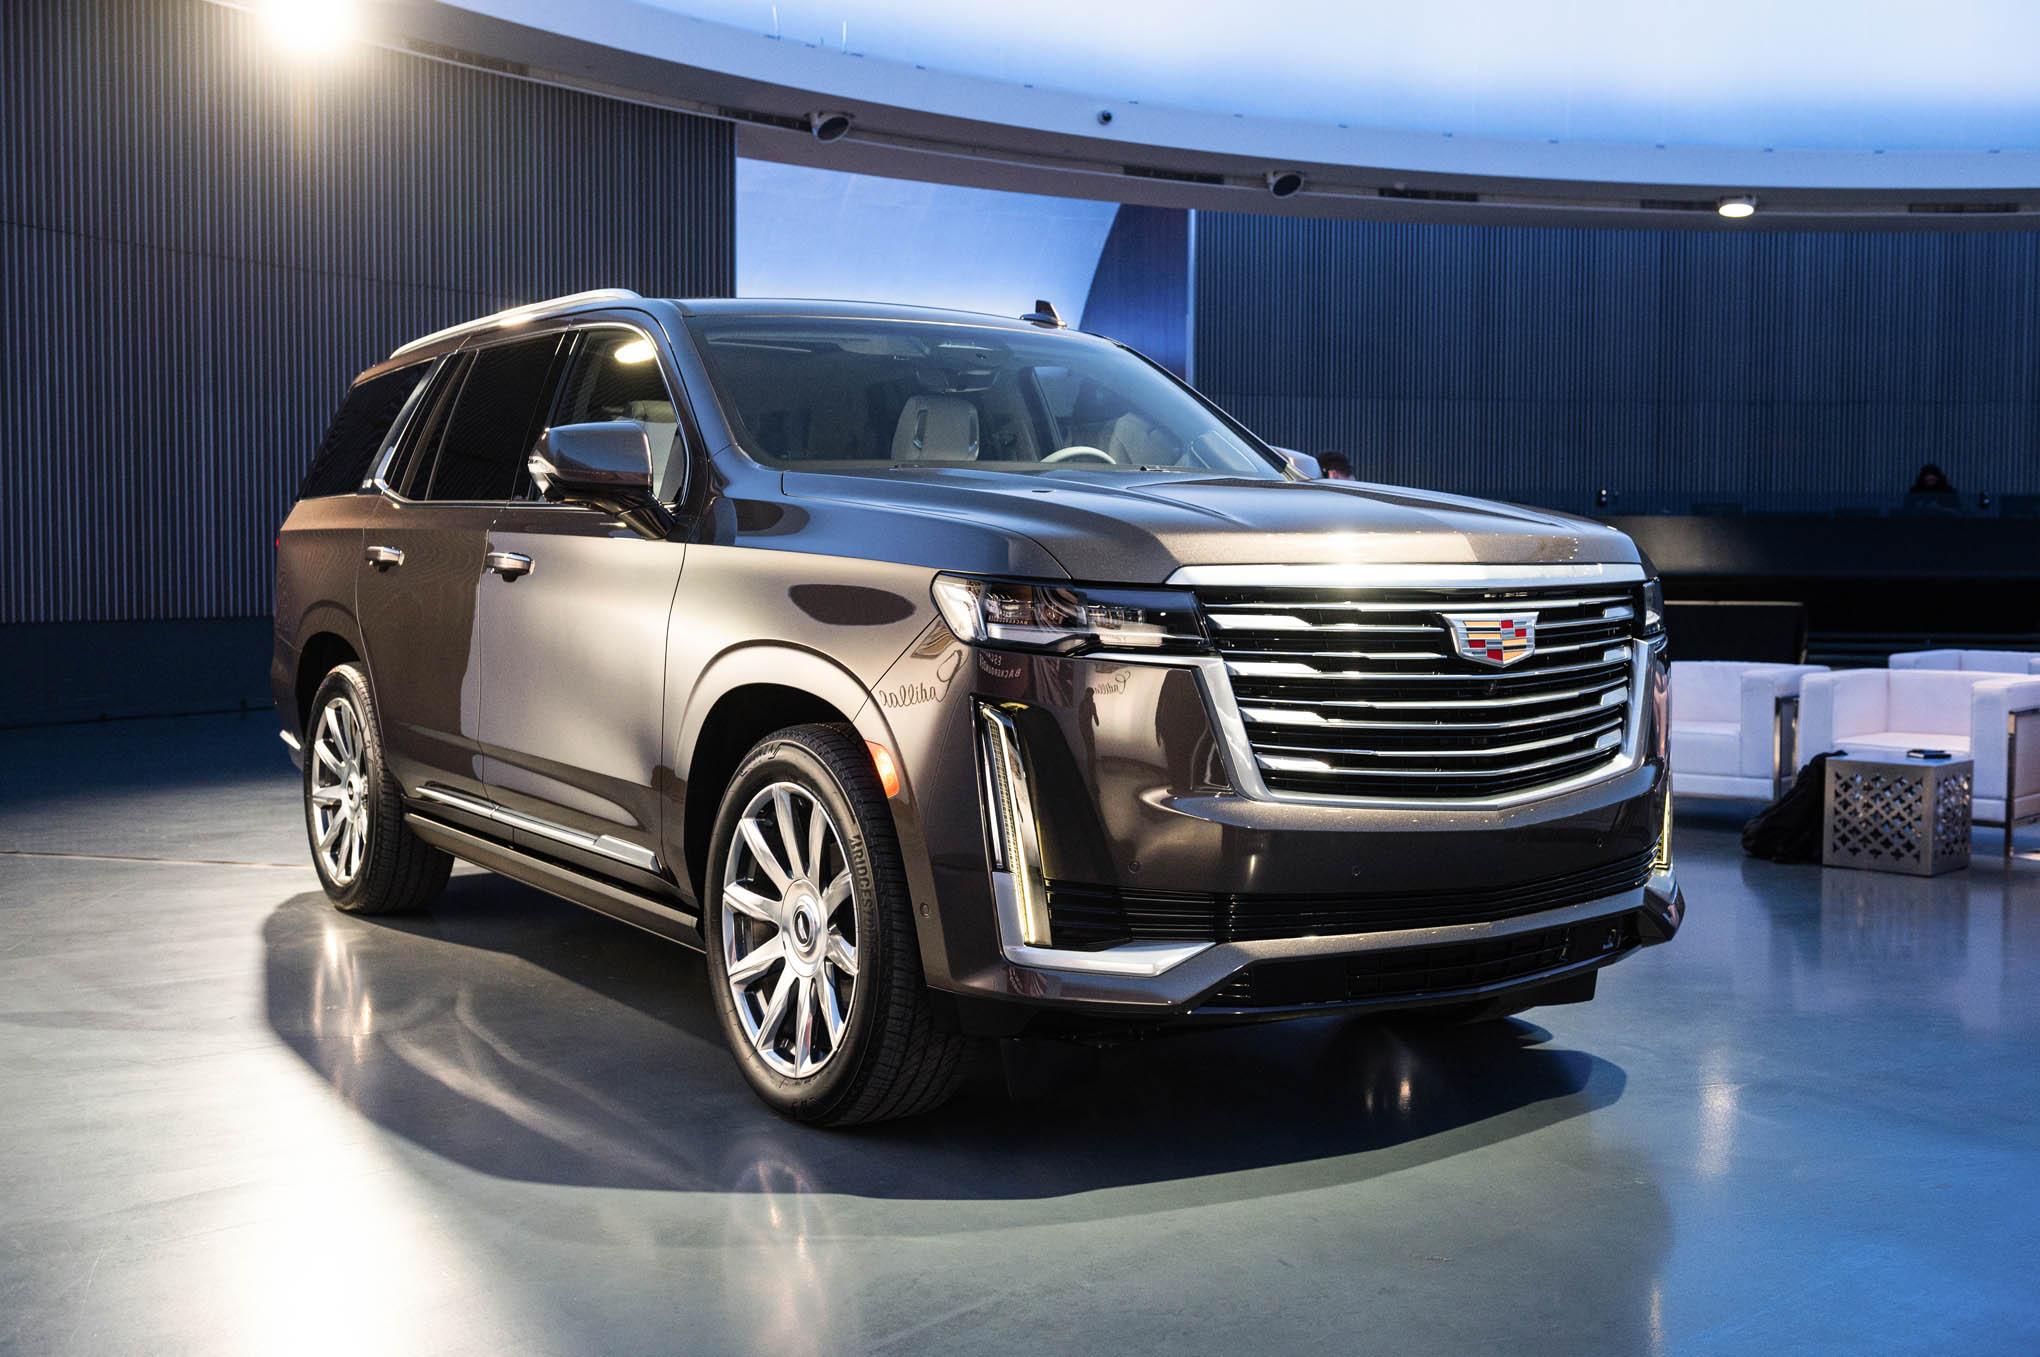 2021 Cadillac Escalade 3.0L Diesel I-6 - FOUR WHEELER NETWORK